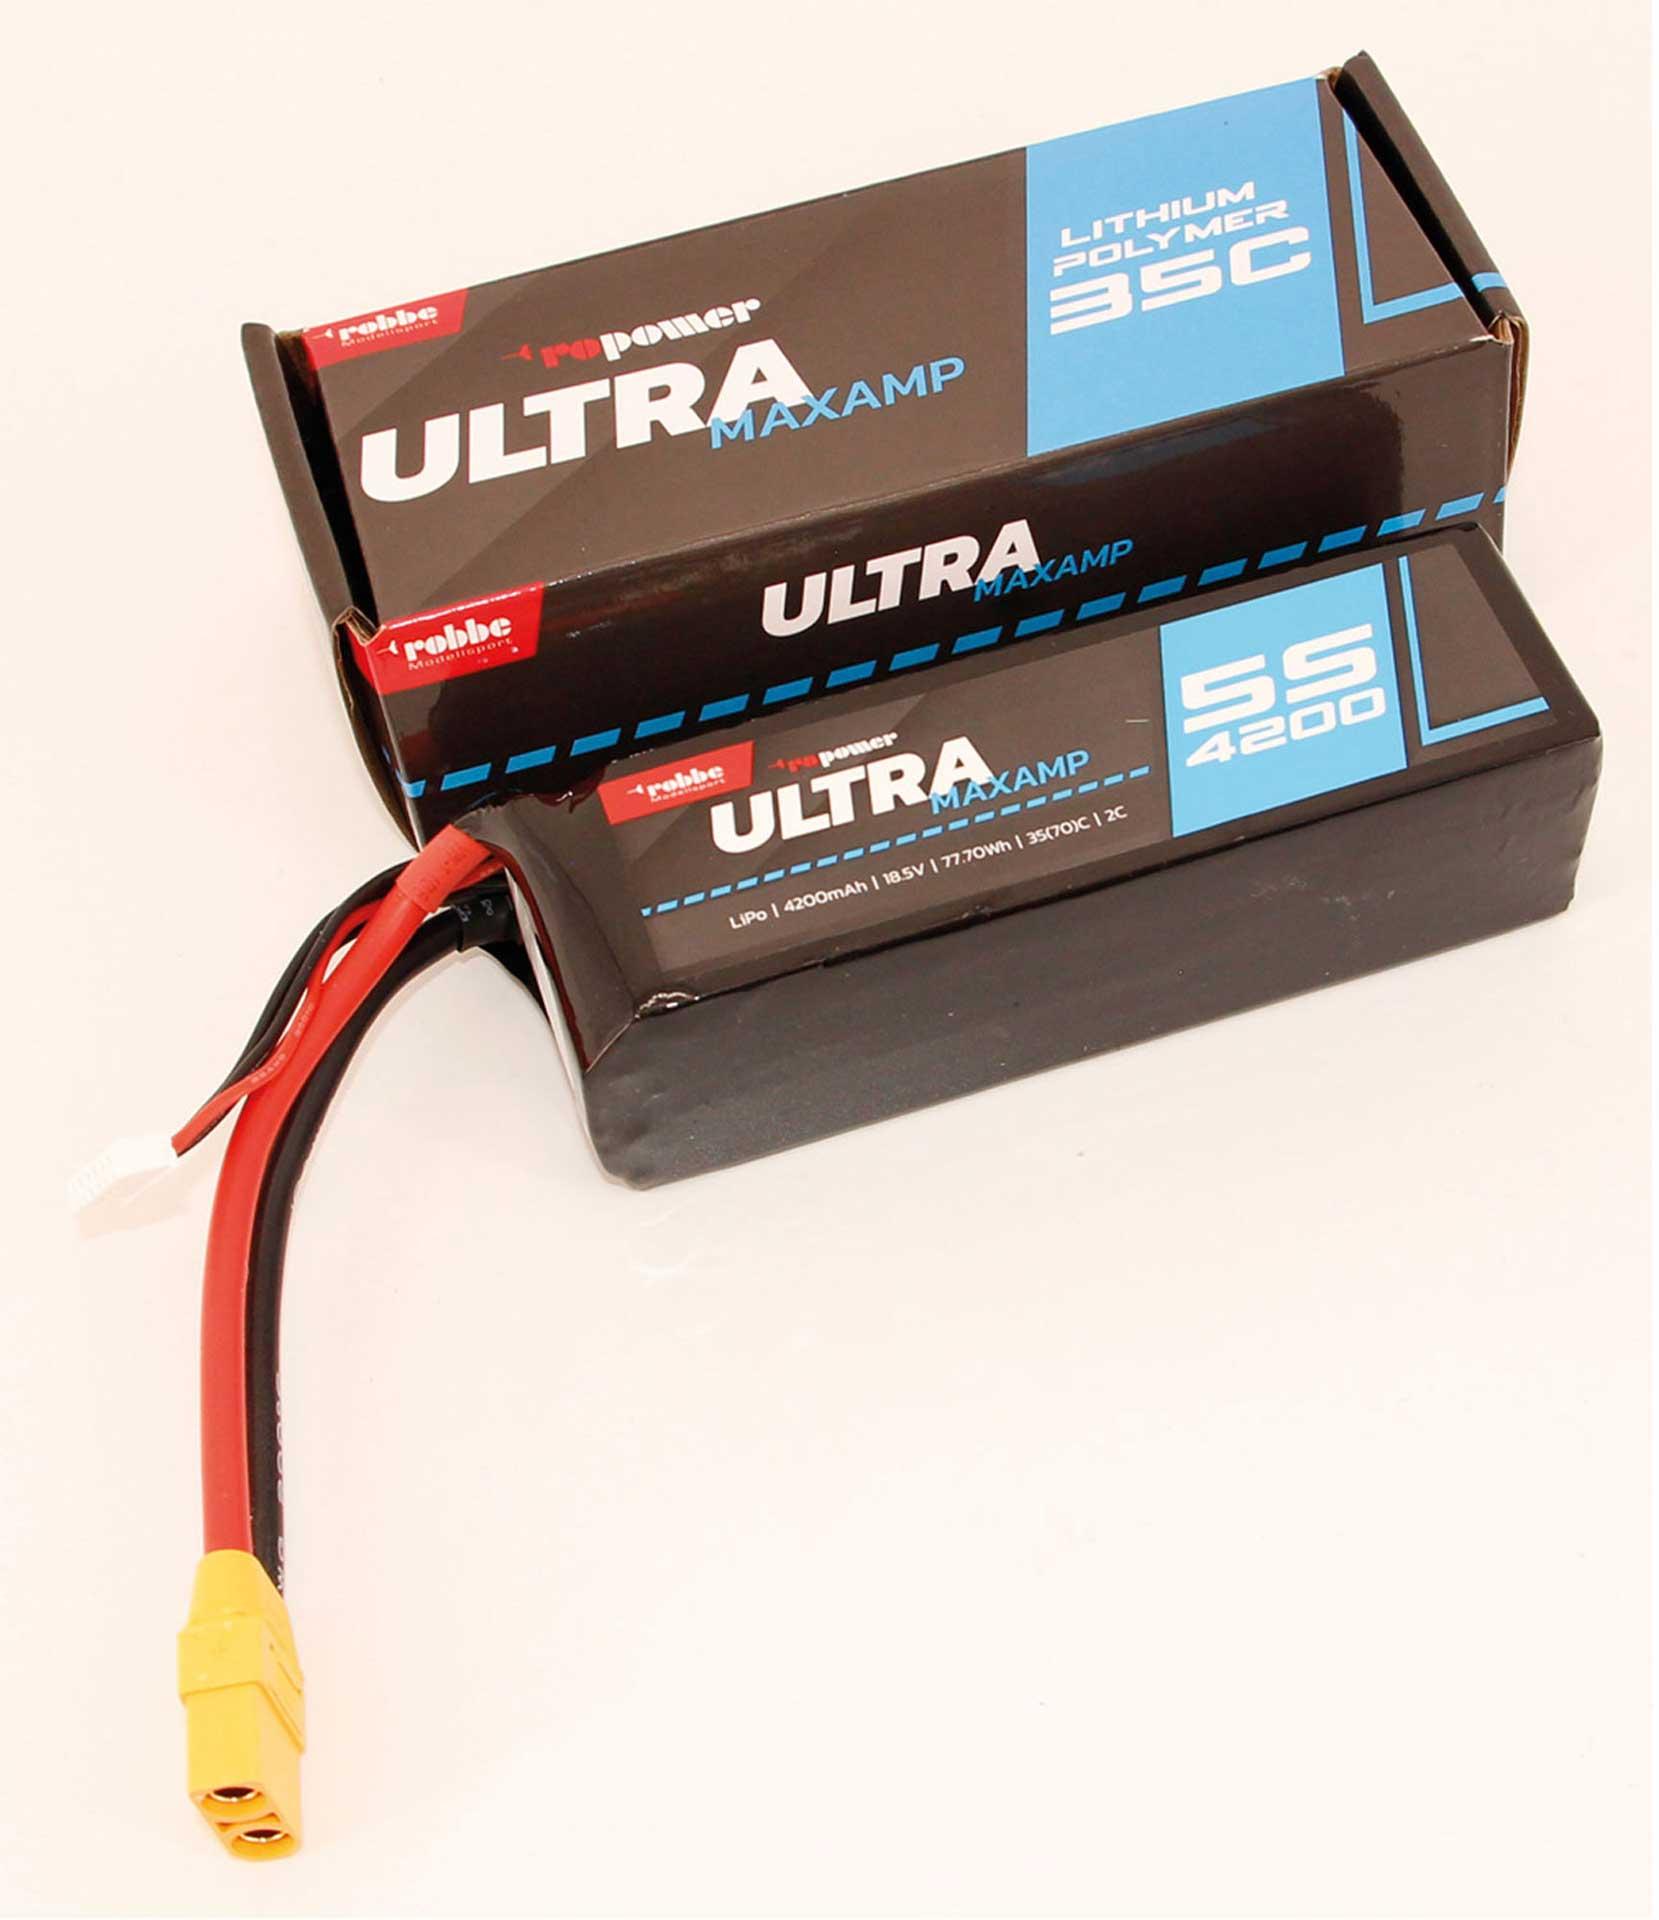 Robbe Modellsport RO-POWER ULTRA MAXAMP 4200MAH 18,5 VOLT 5S 35(70)C LIPO AKKU